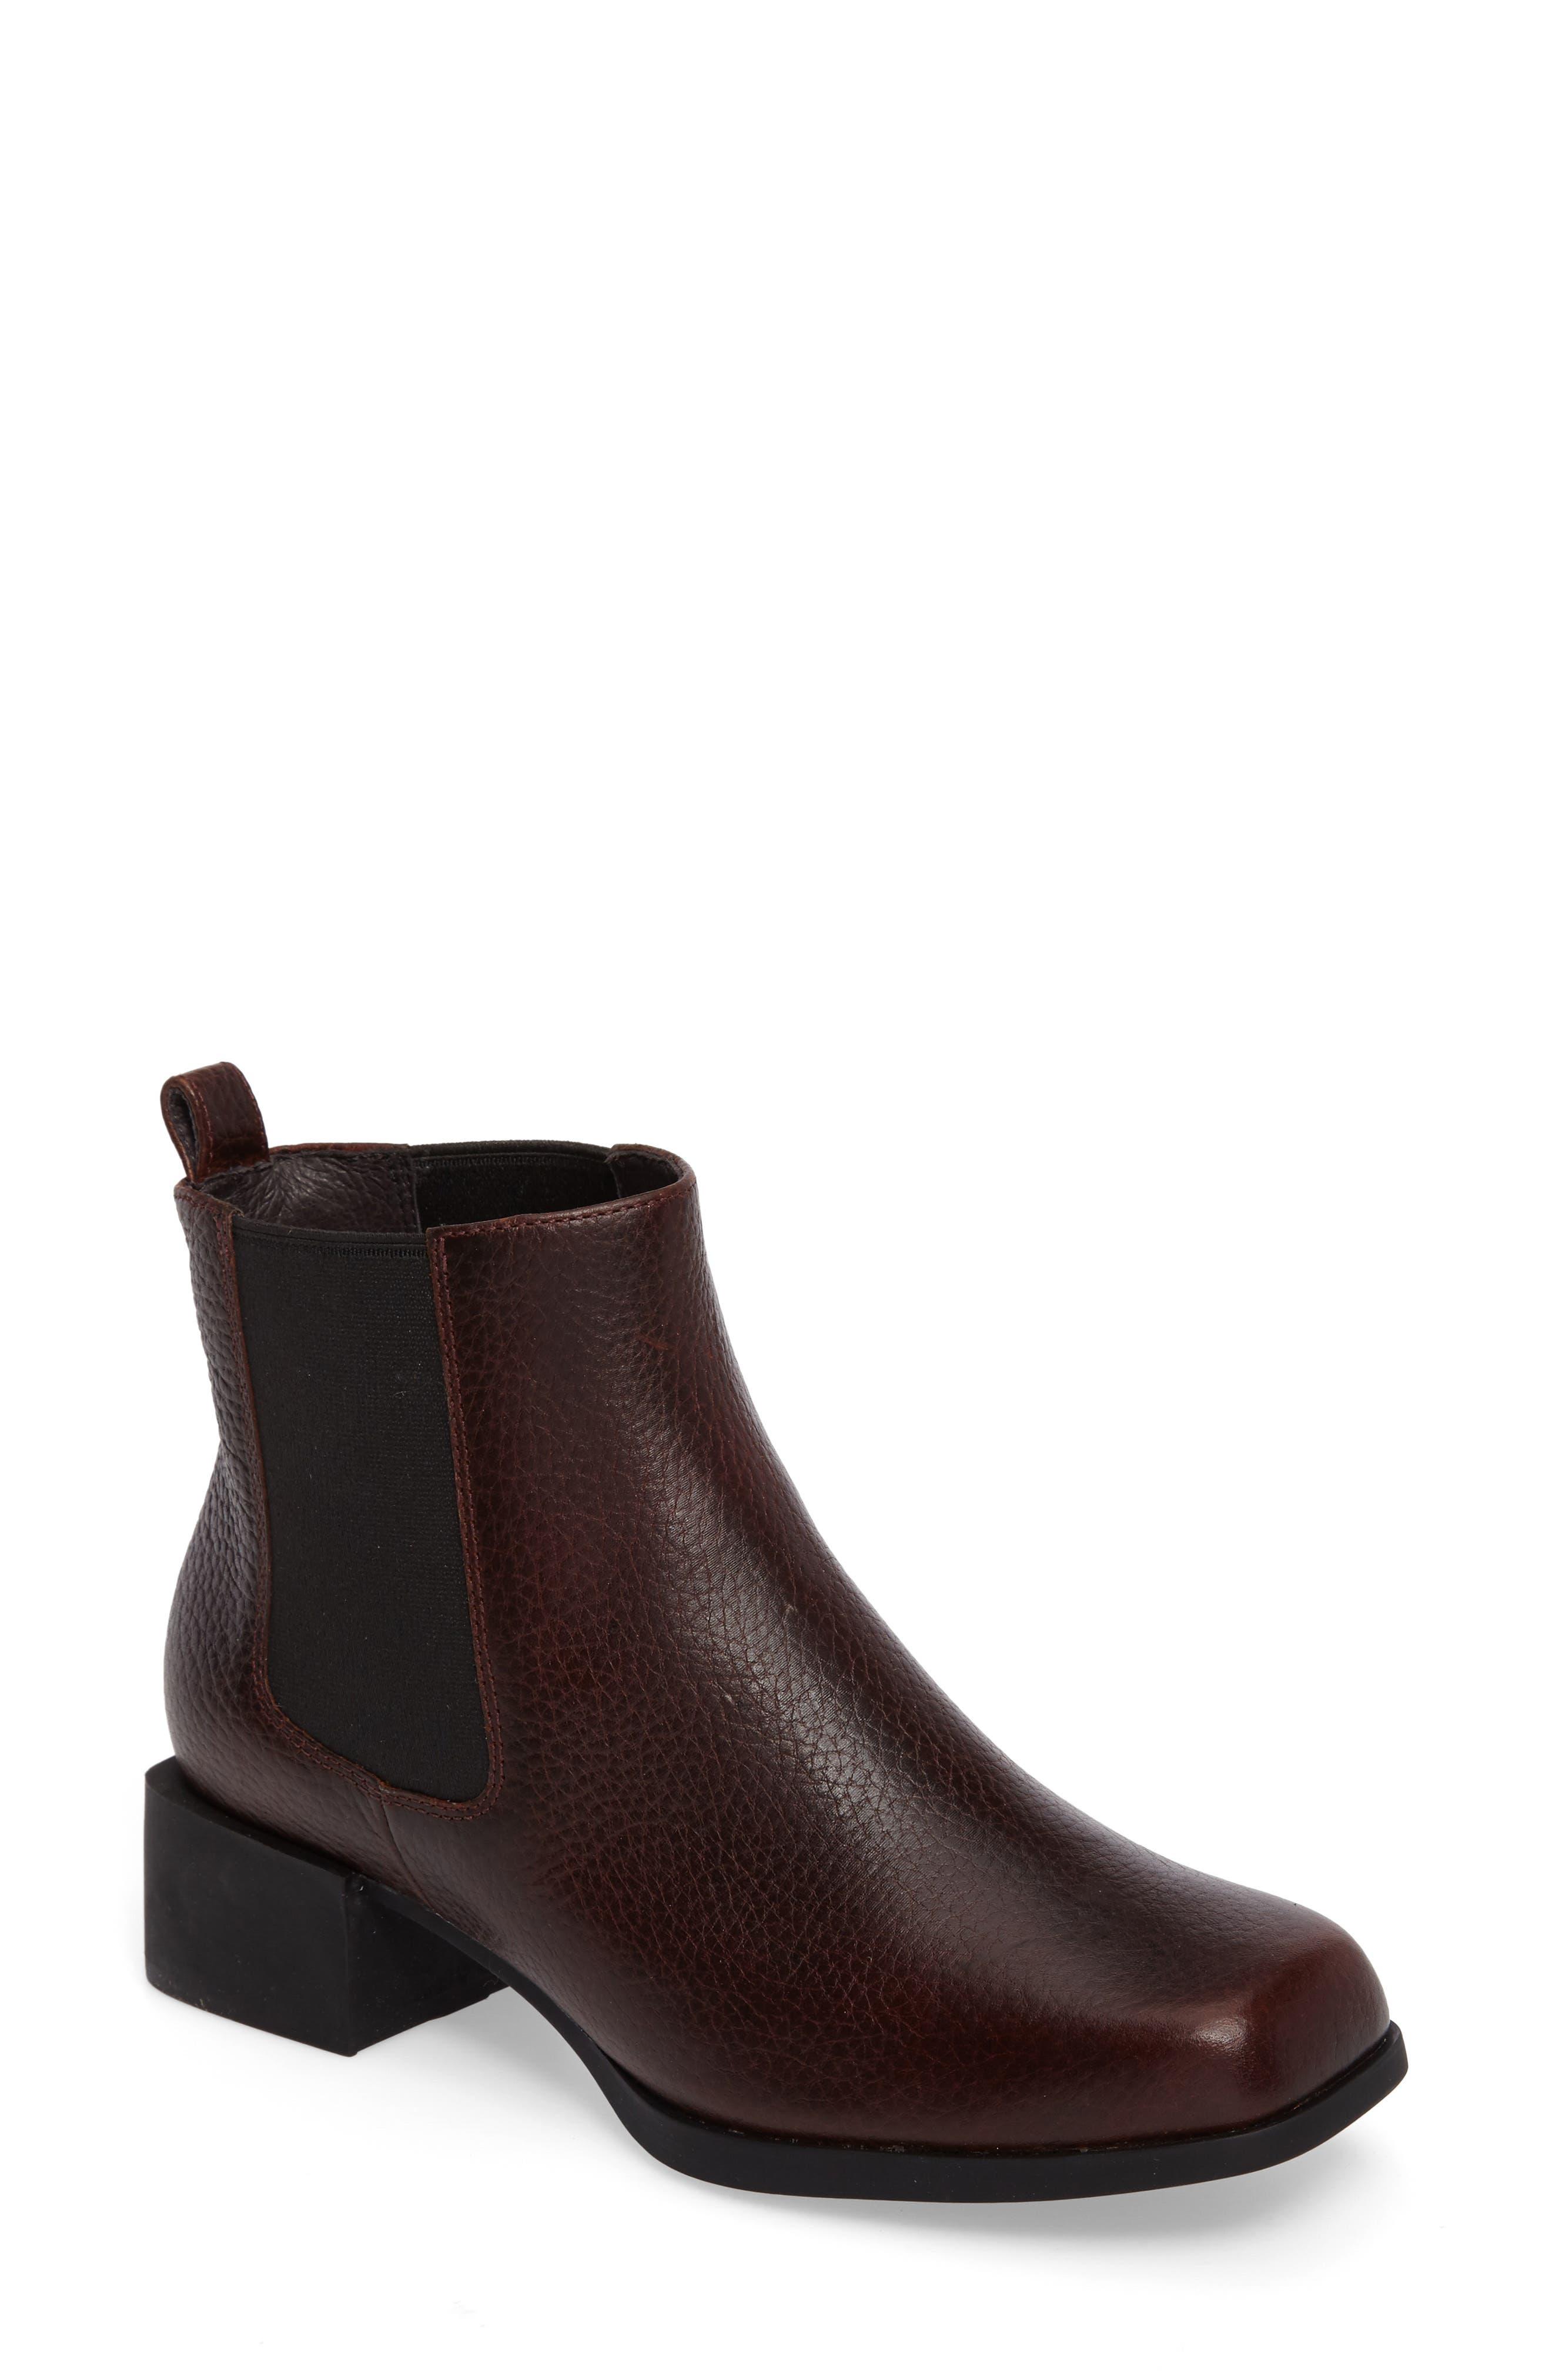 Kobo Chelsea Boot,                             Main thumbnail 1, color,                             Medium Brown Leather